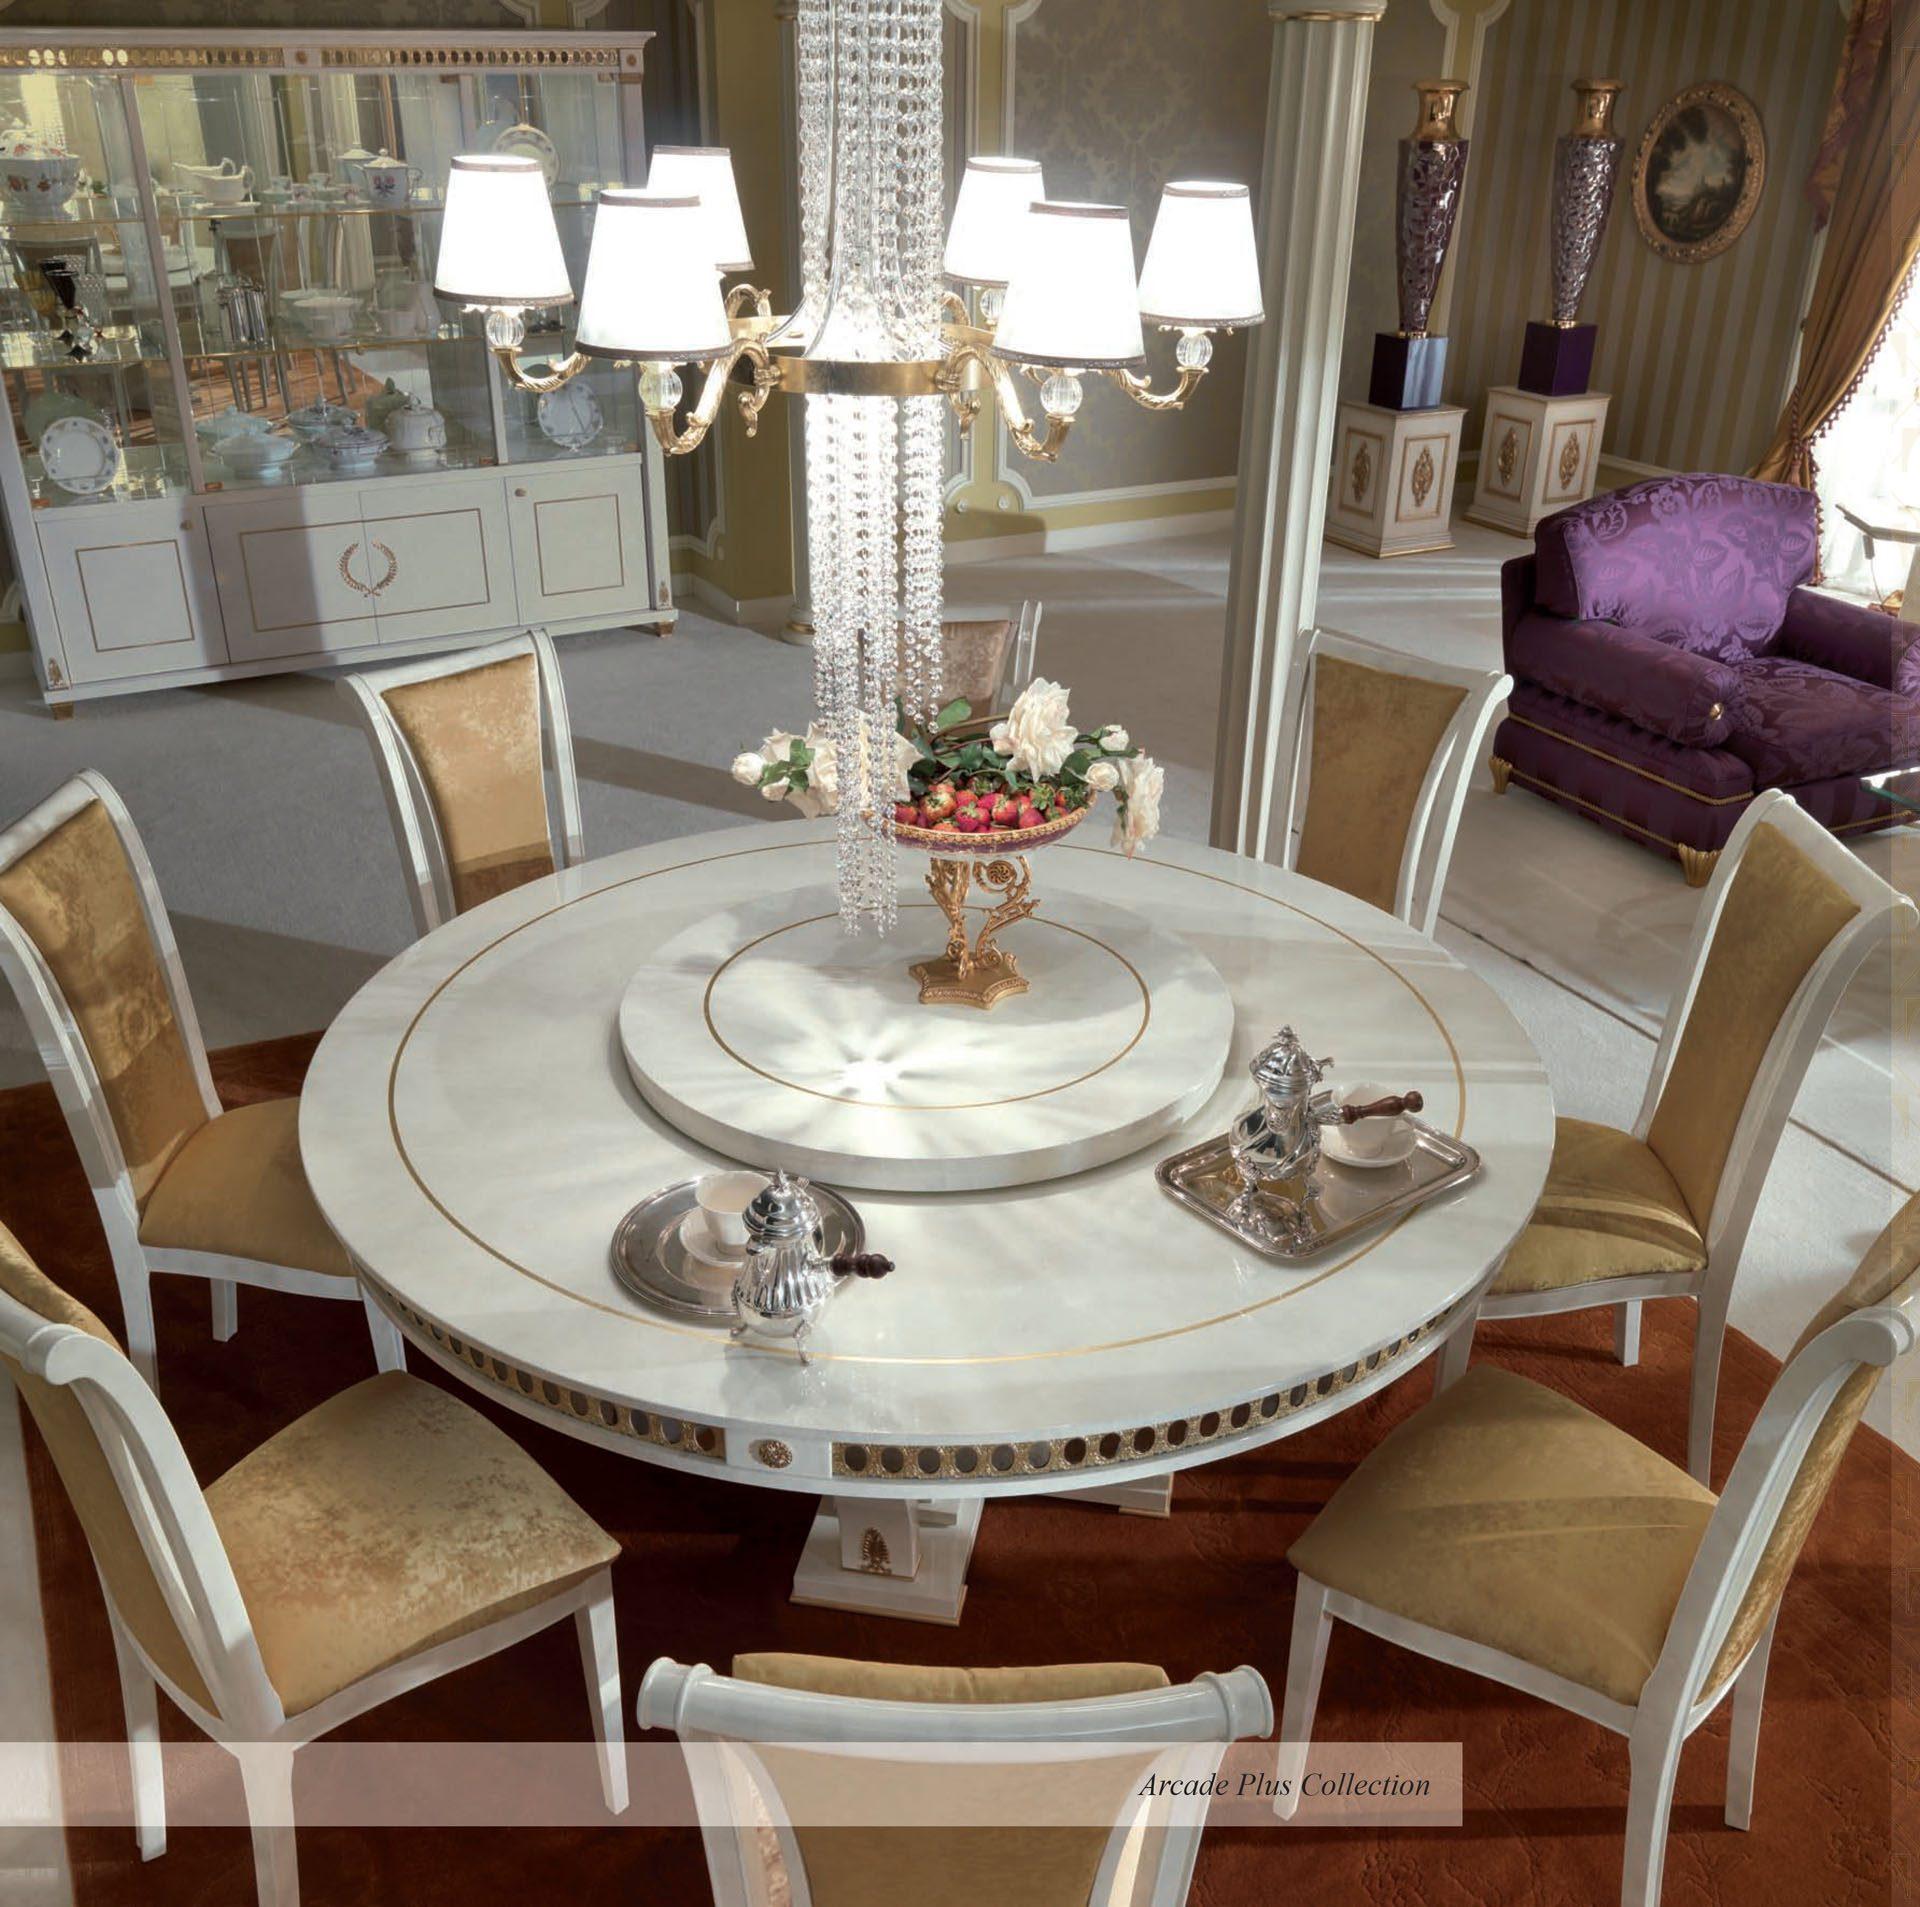 Arcade Plus Dining Table